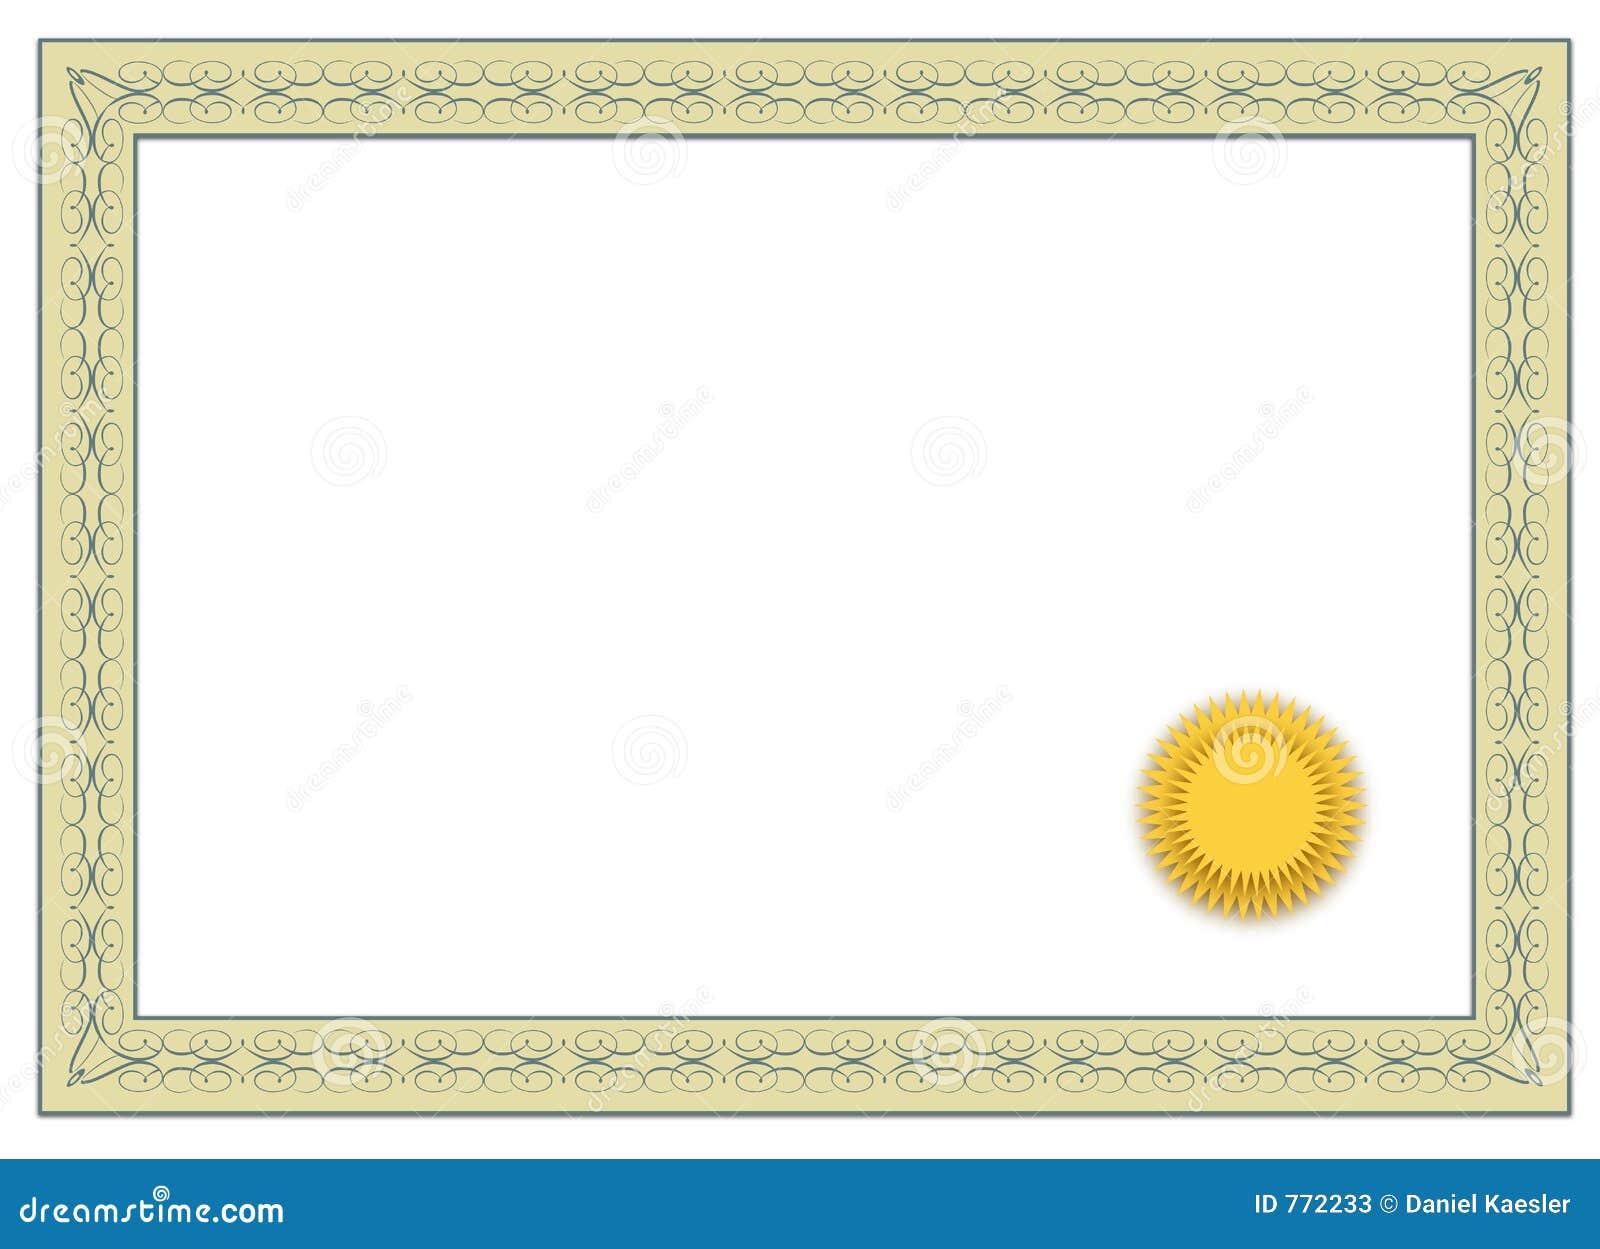 Blank certificate background hatchurbanskript blank certificate background xflitez Images